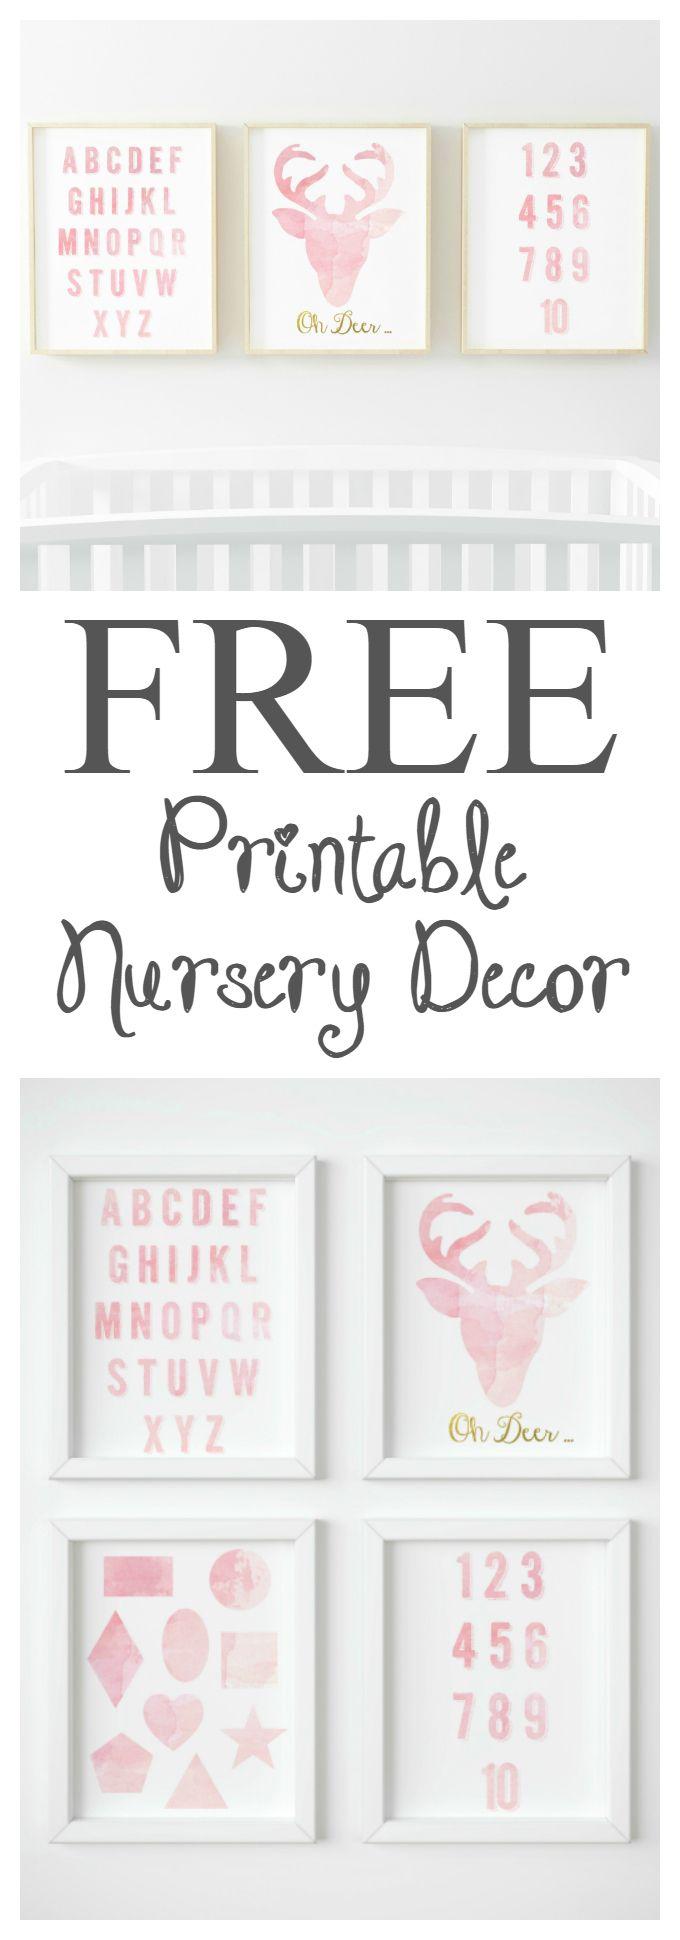 Free Printable Watercolour Nursery Decor Diy Nursery Decor Baby